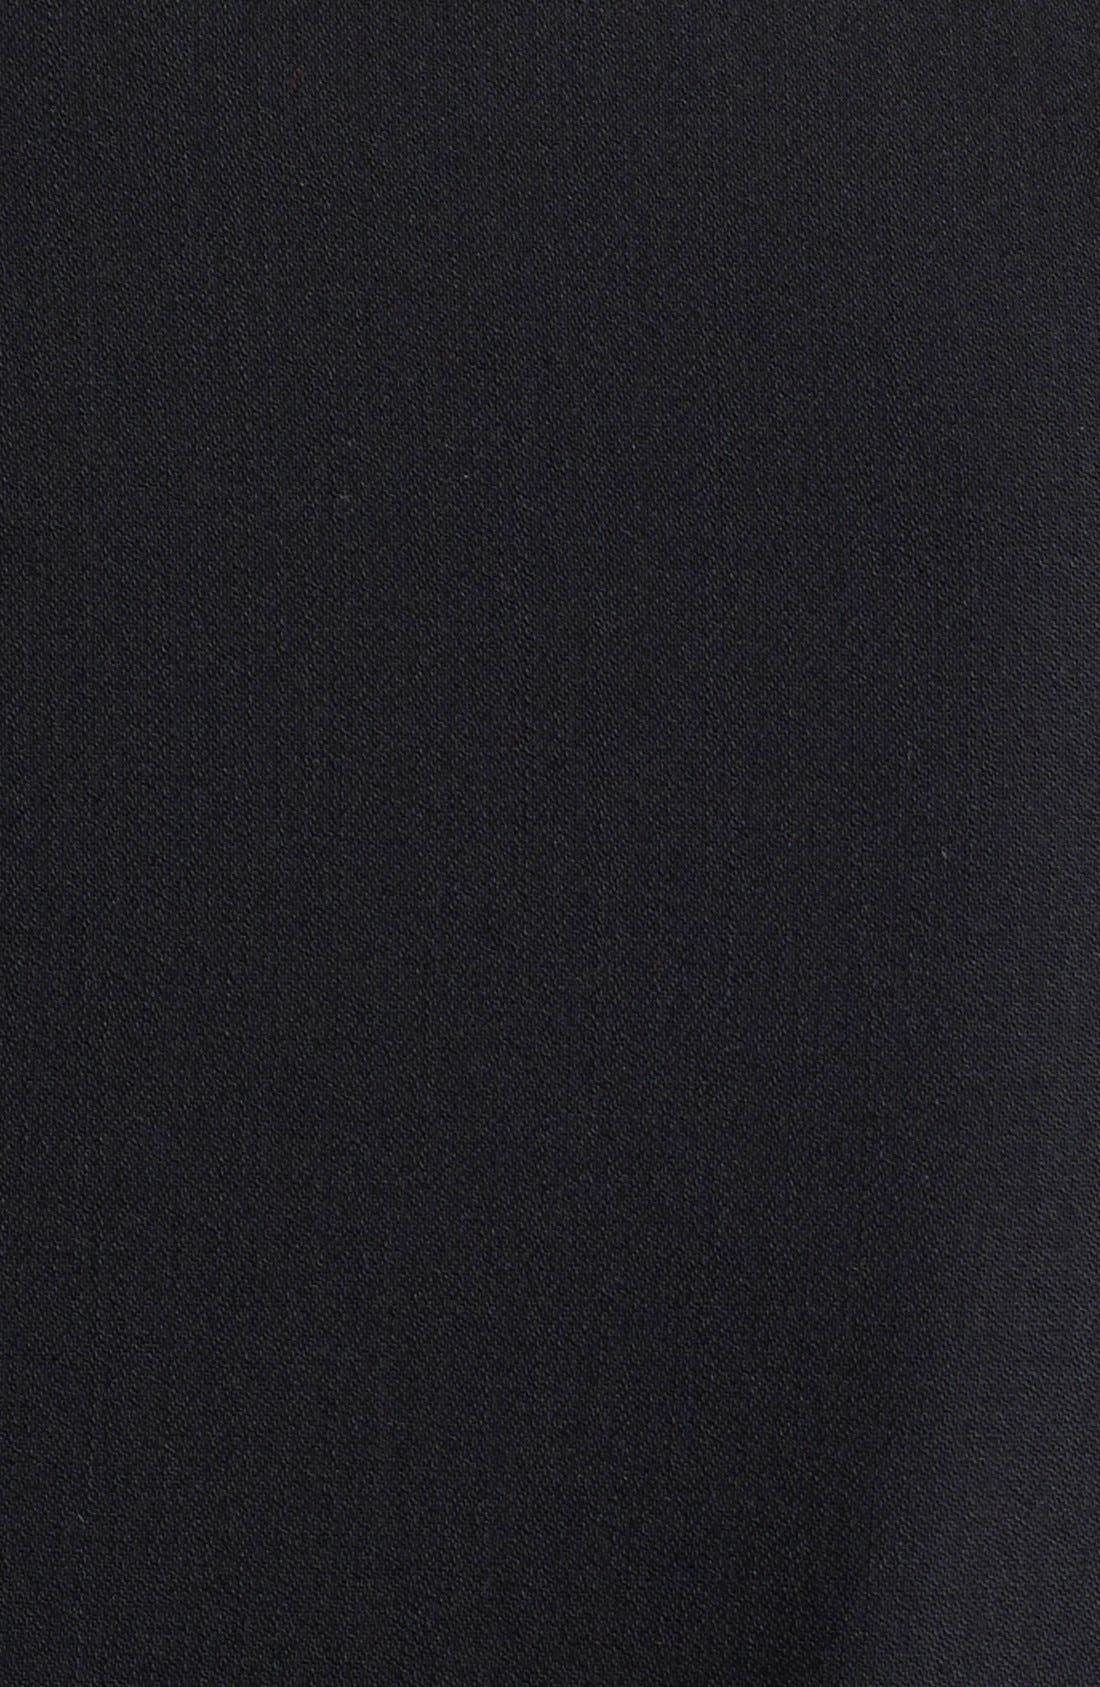 AKRIS PUNTO, Long One-Button Jacket, Alternate thumbnail 9, color, BLACK